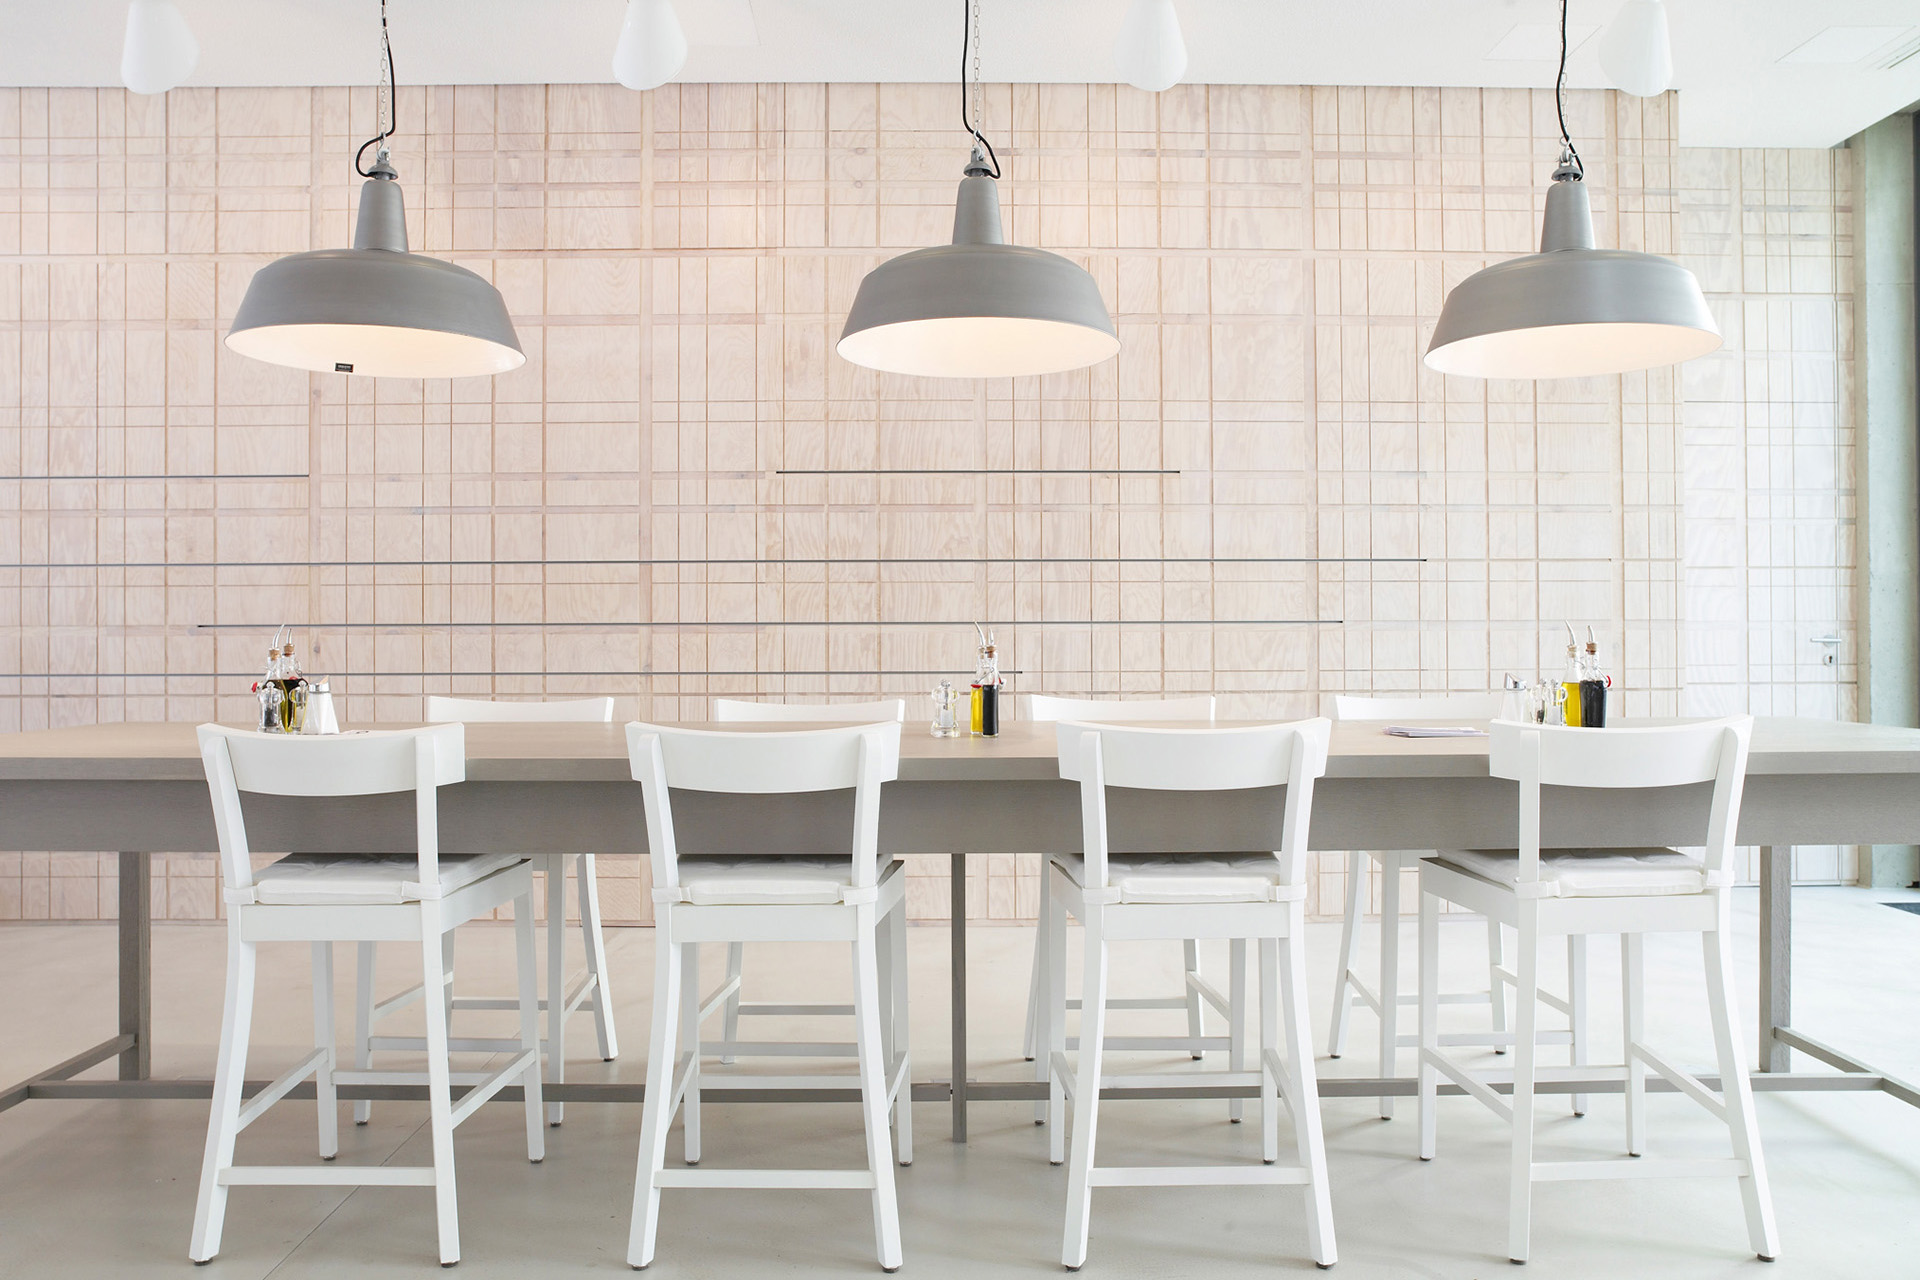 008-interior-design-hospitality-restaurant-ocui-open-cuisine-muenchen-buero-philipp-moeller.jpg